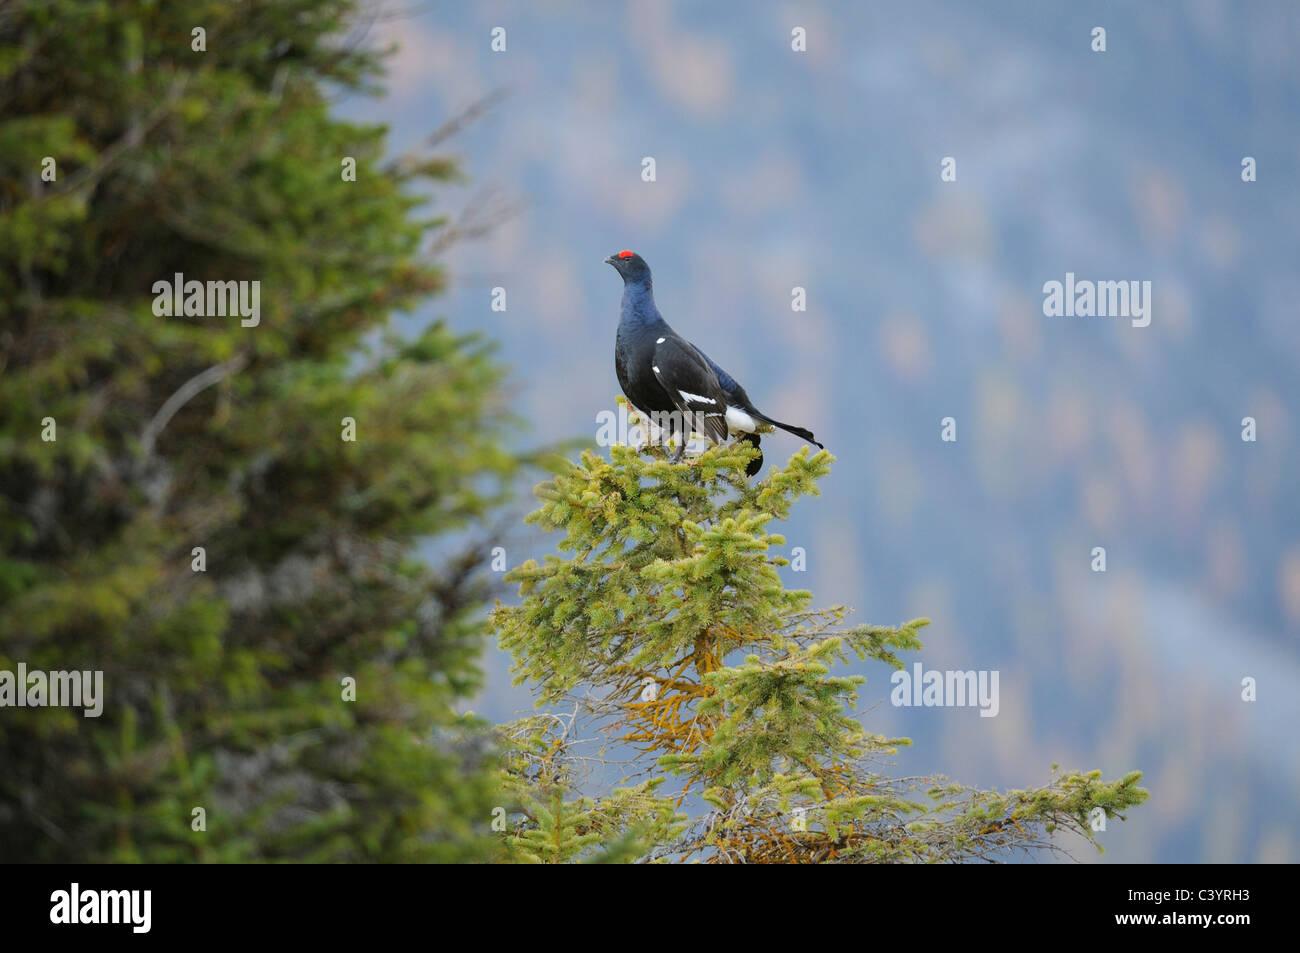 Black Grouse, Tetrao tetrix, Tetraonidae family, near Andeer, Grisons, Switzerland, Europe - Stock Image